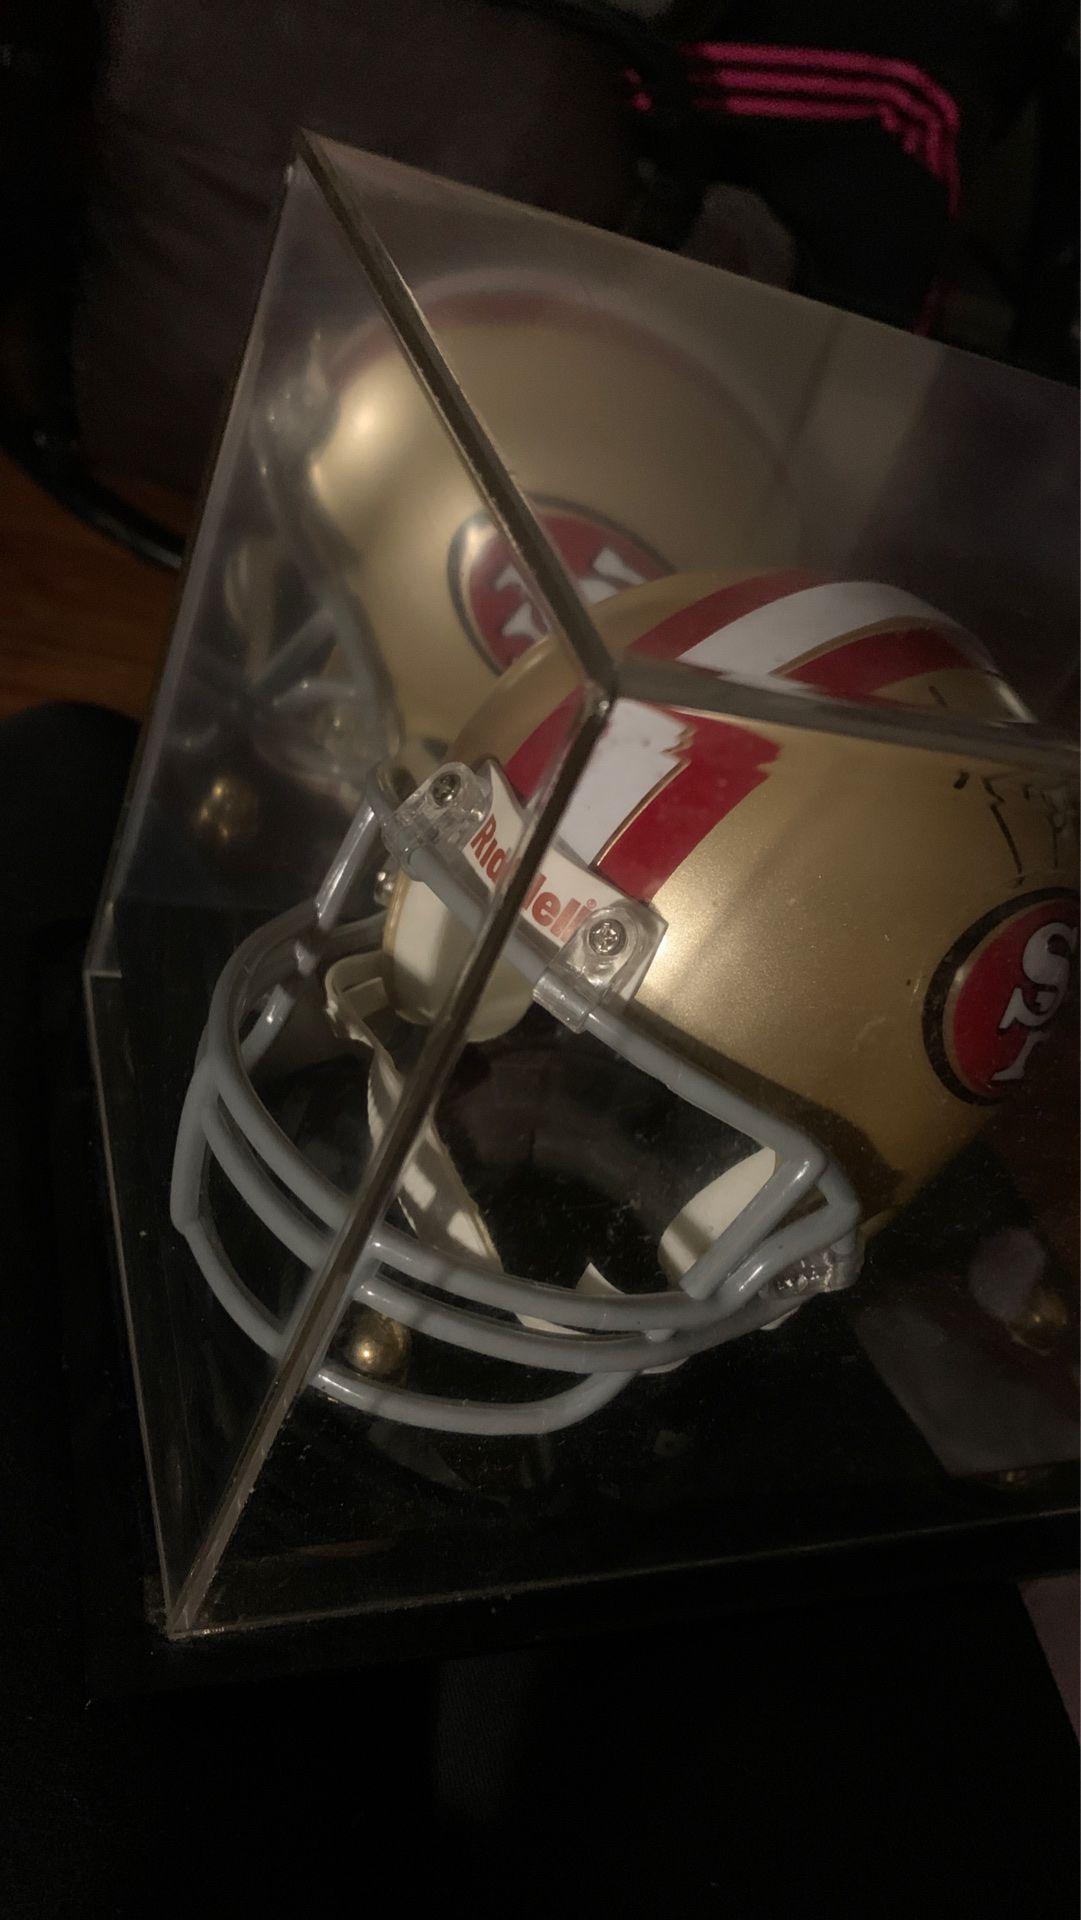 Autographed San Francisco 49er helmet